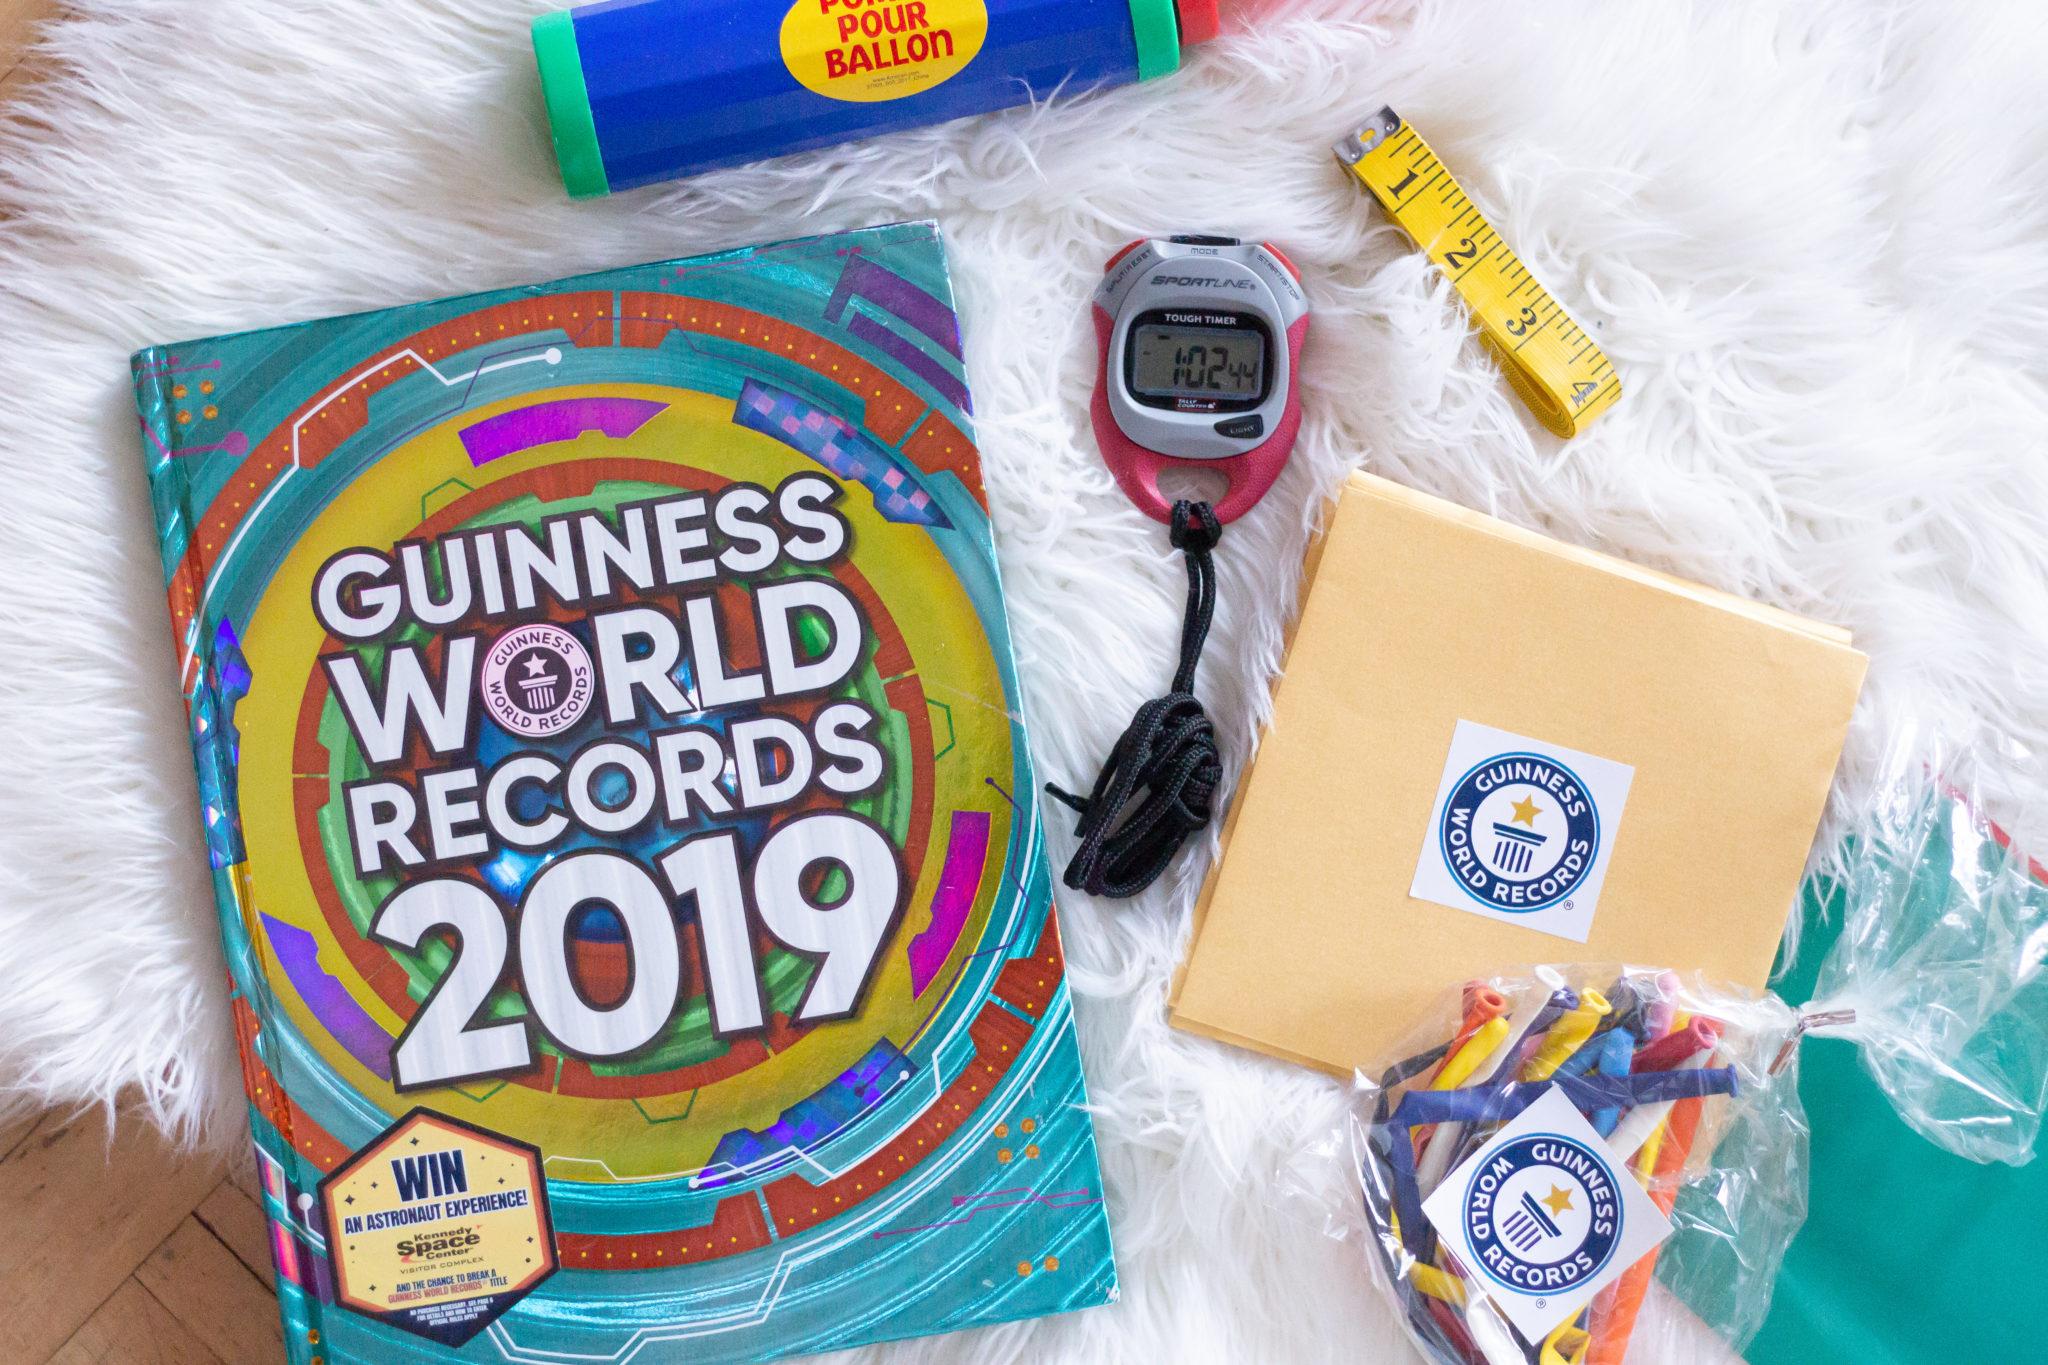 2019 Guinness World Records: Fastest Balloon Blower?